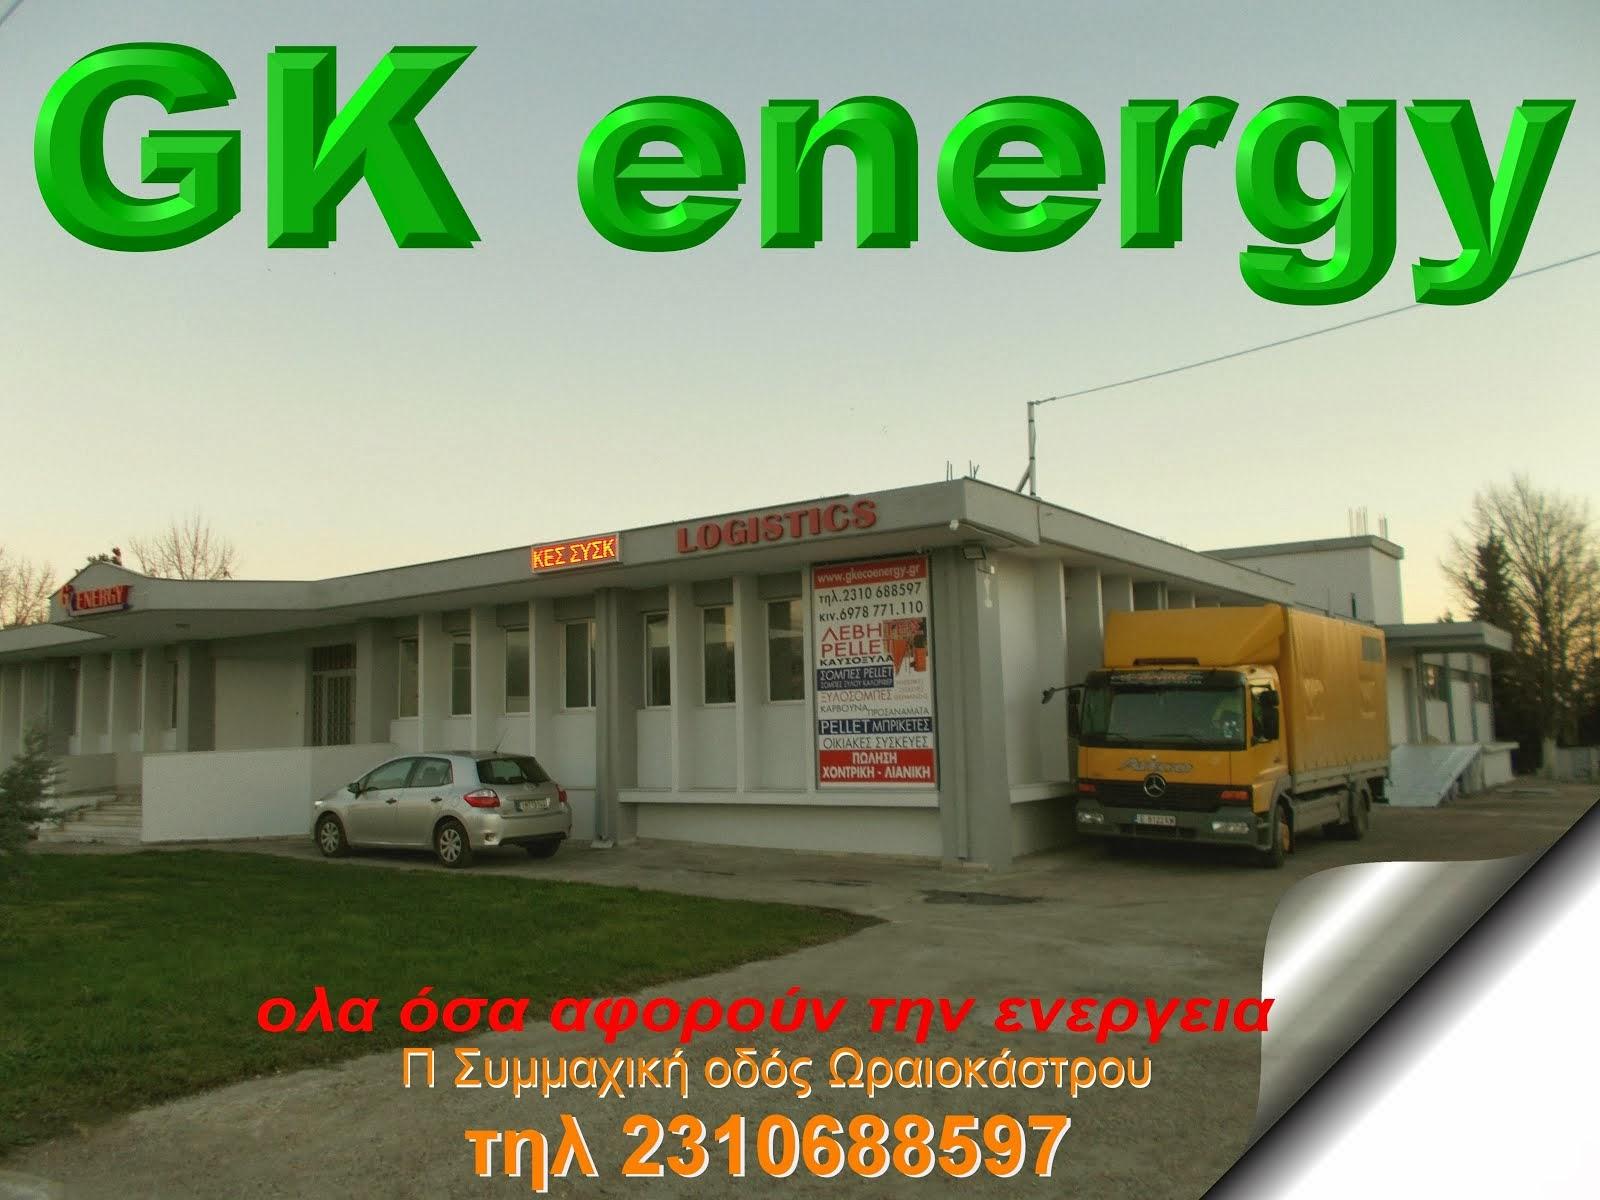 GK ENERGY LTD